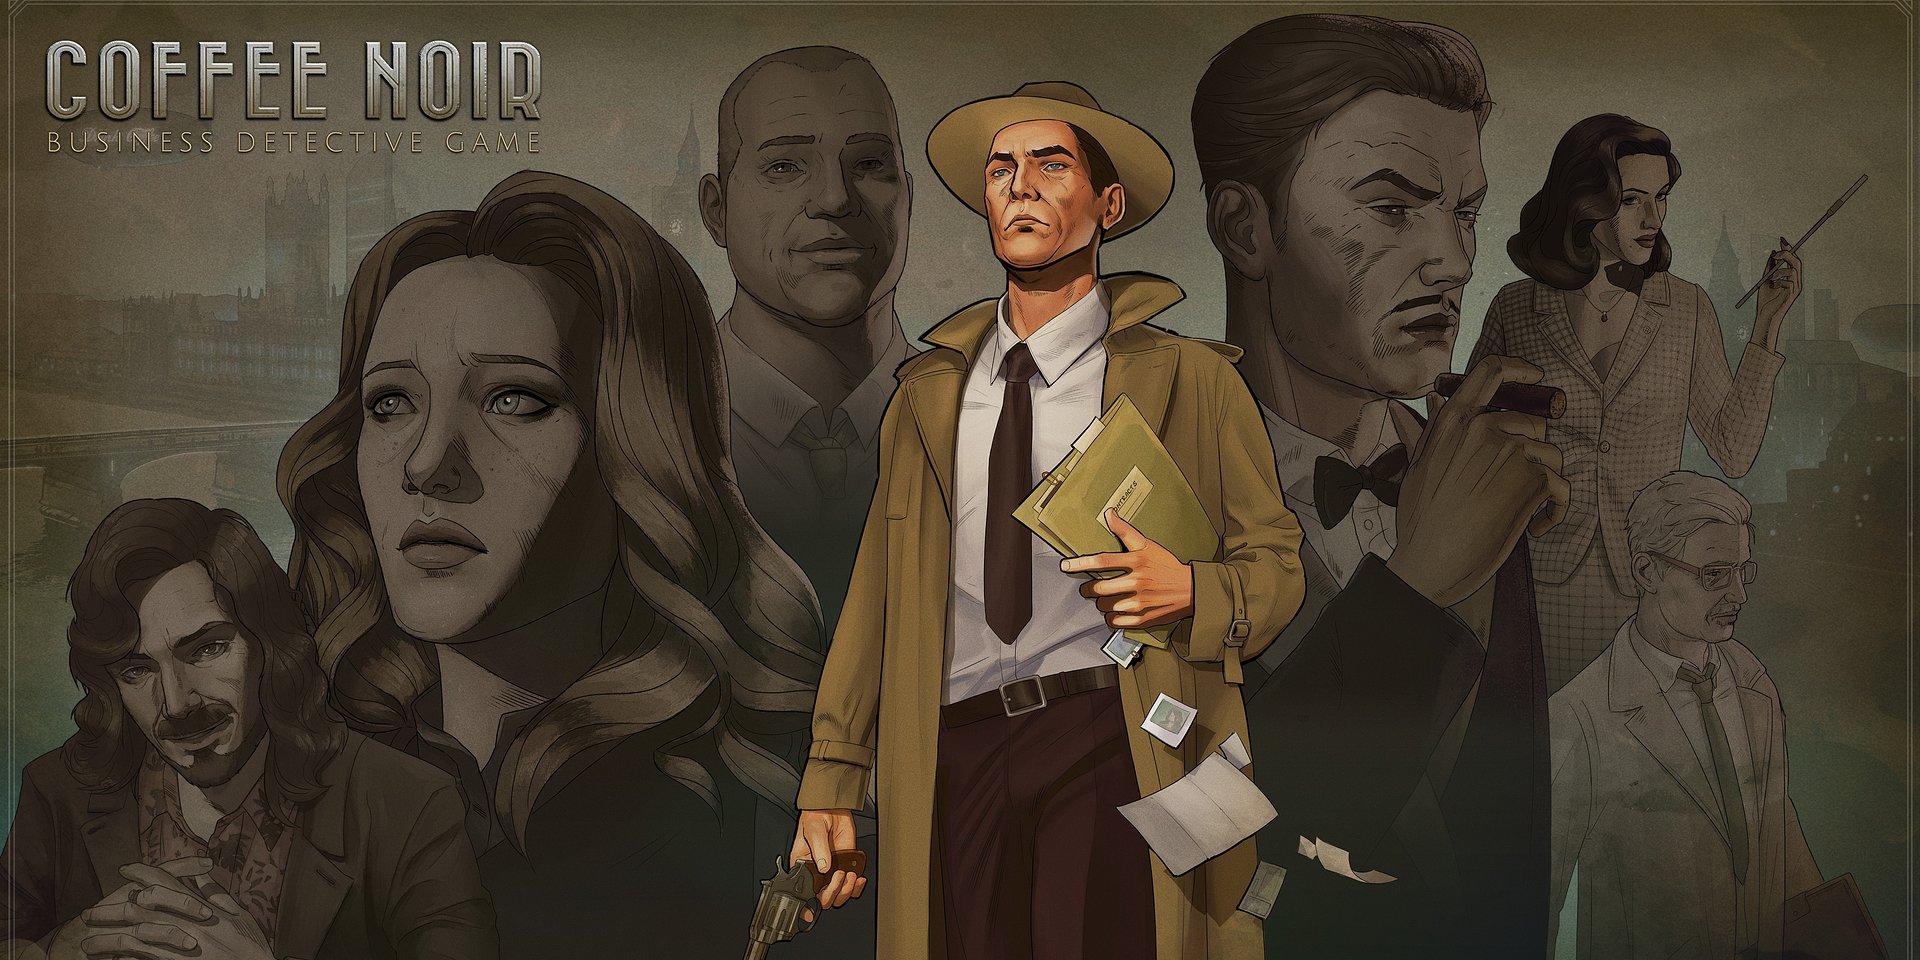 Coffee Noir, нуарная визуальная новелла с элементами бизнес-тайкуна вышла на Steam и GOG!